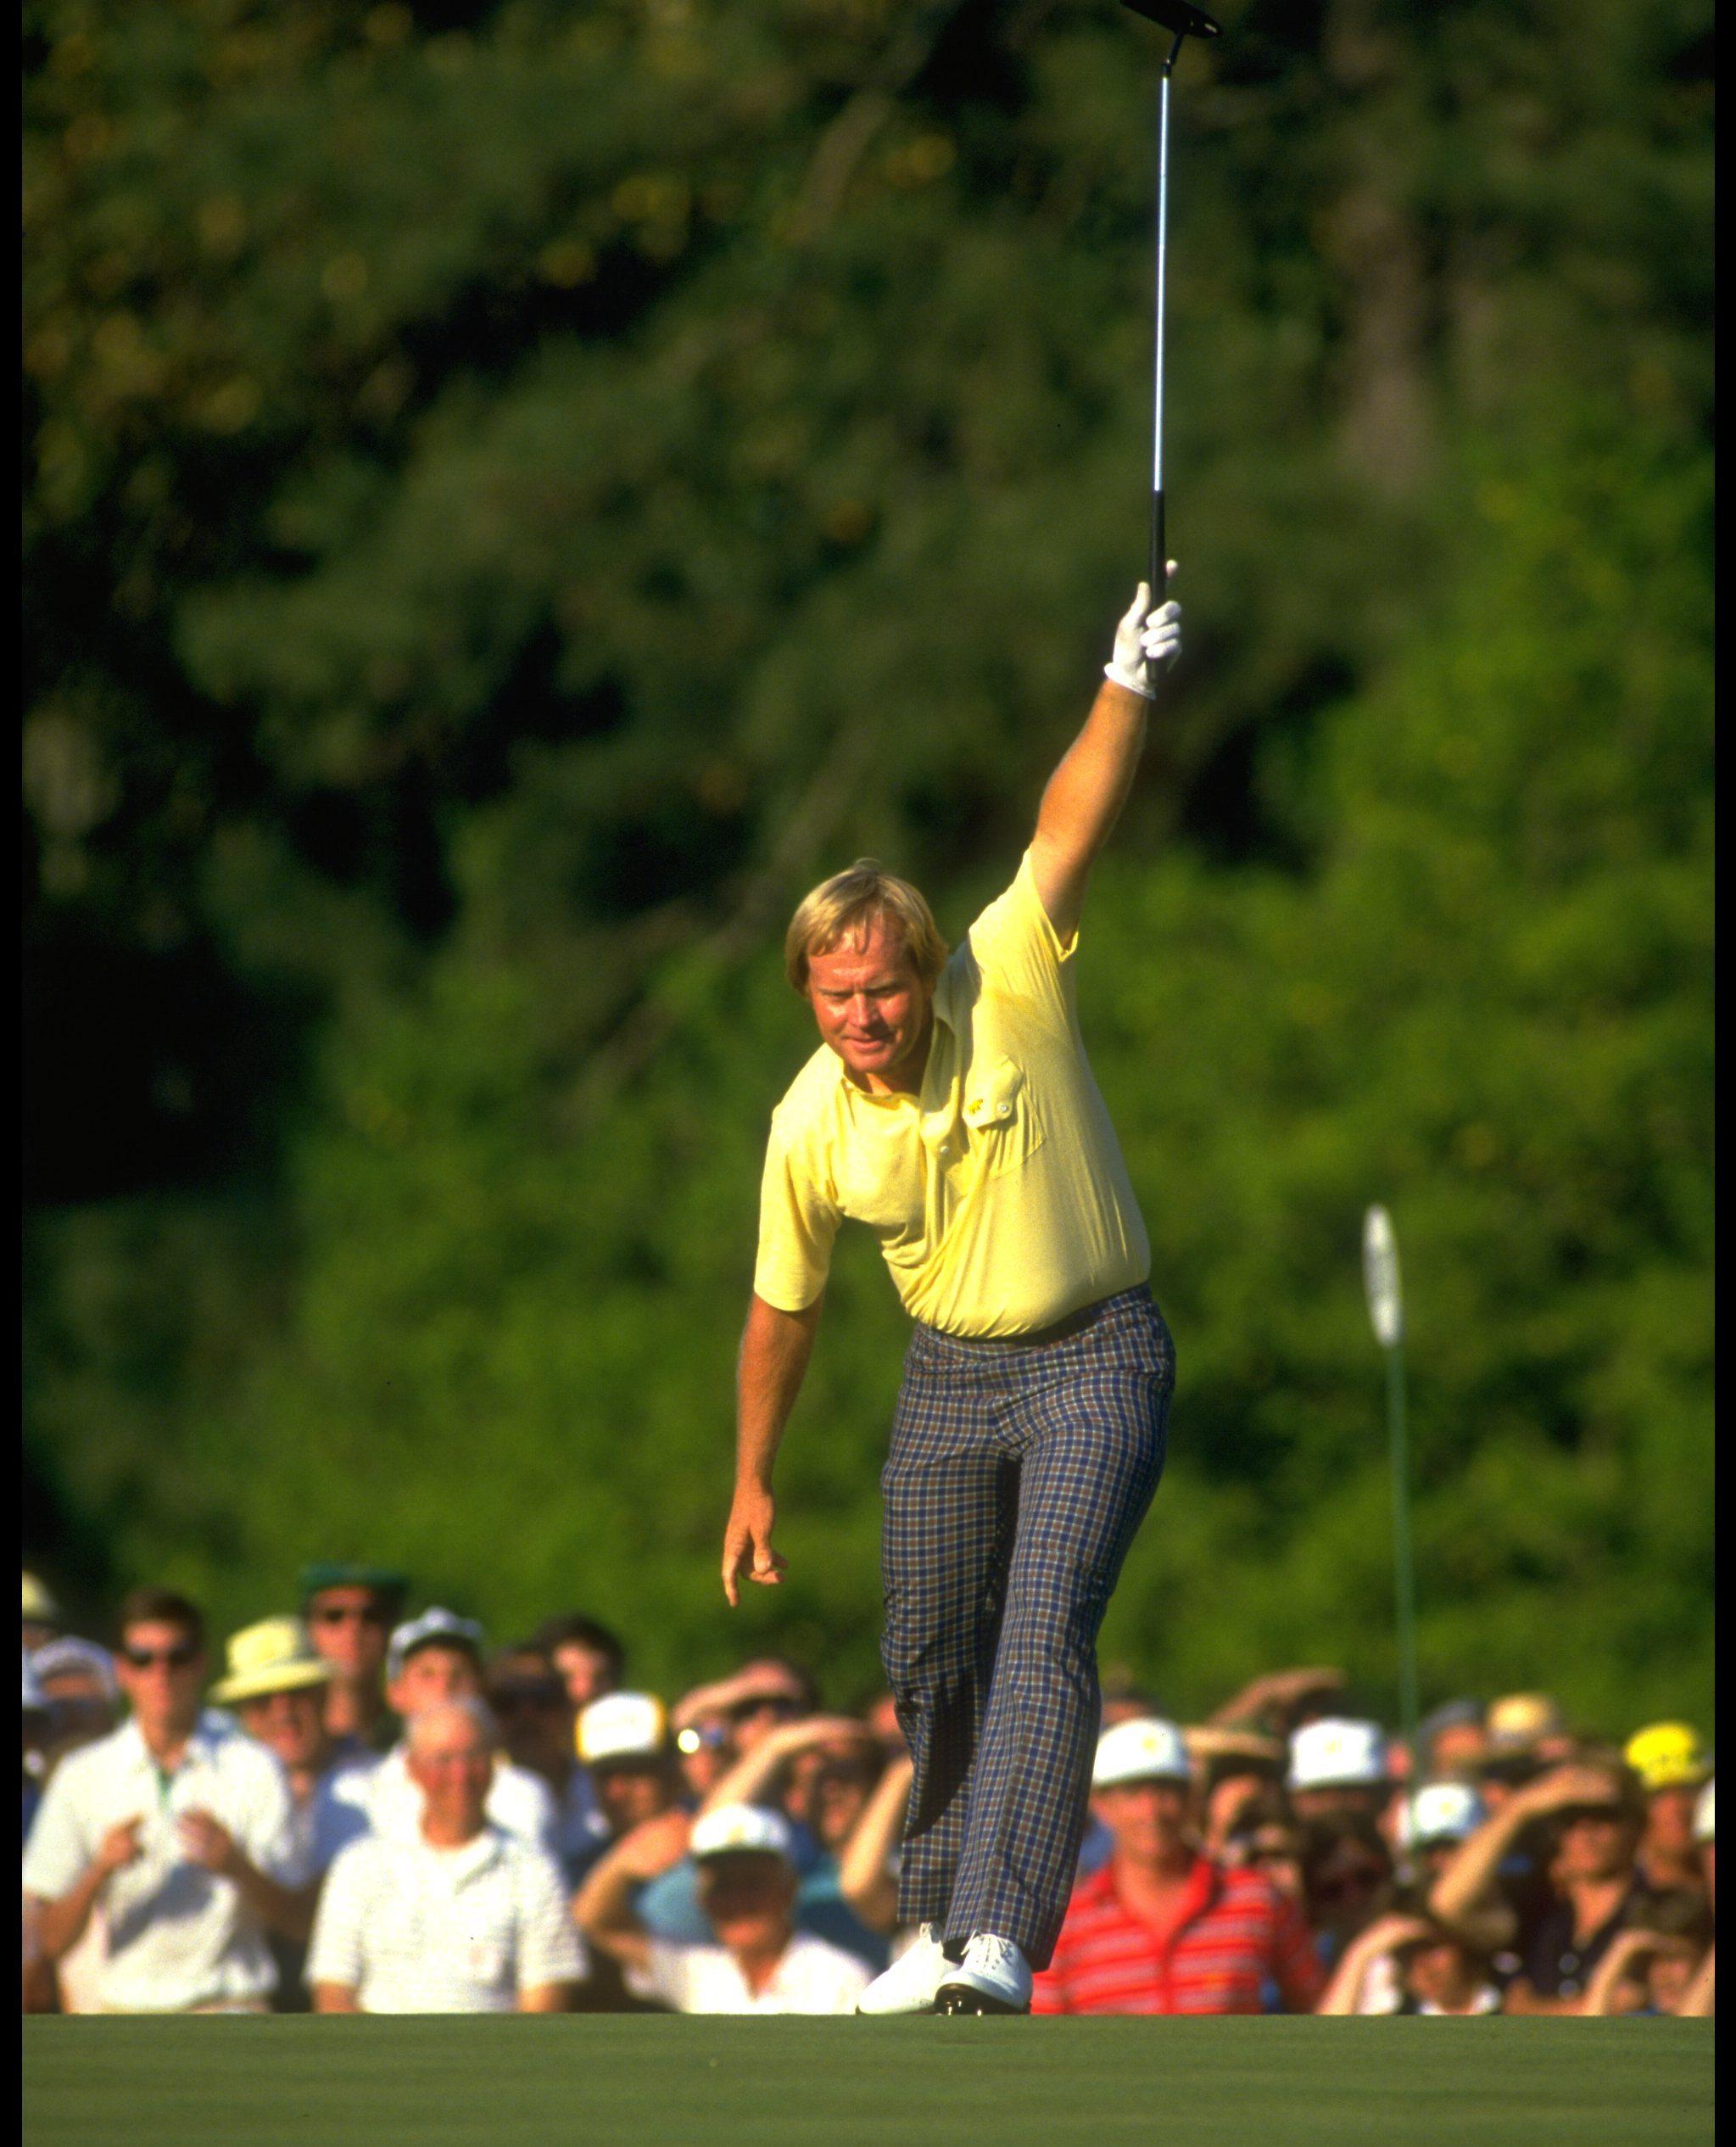 winner of the masters golf tournament